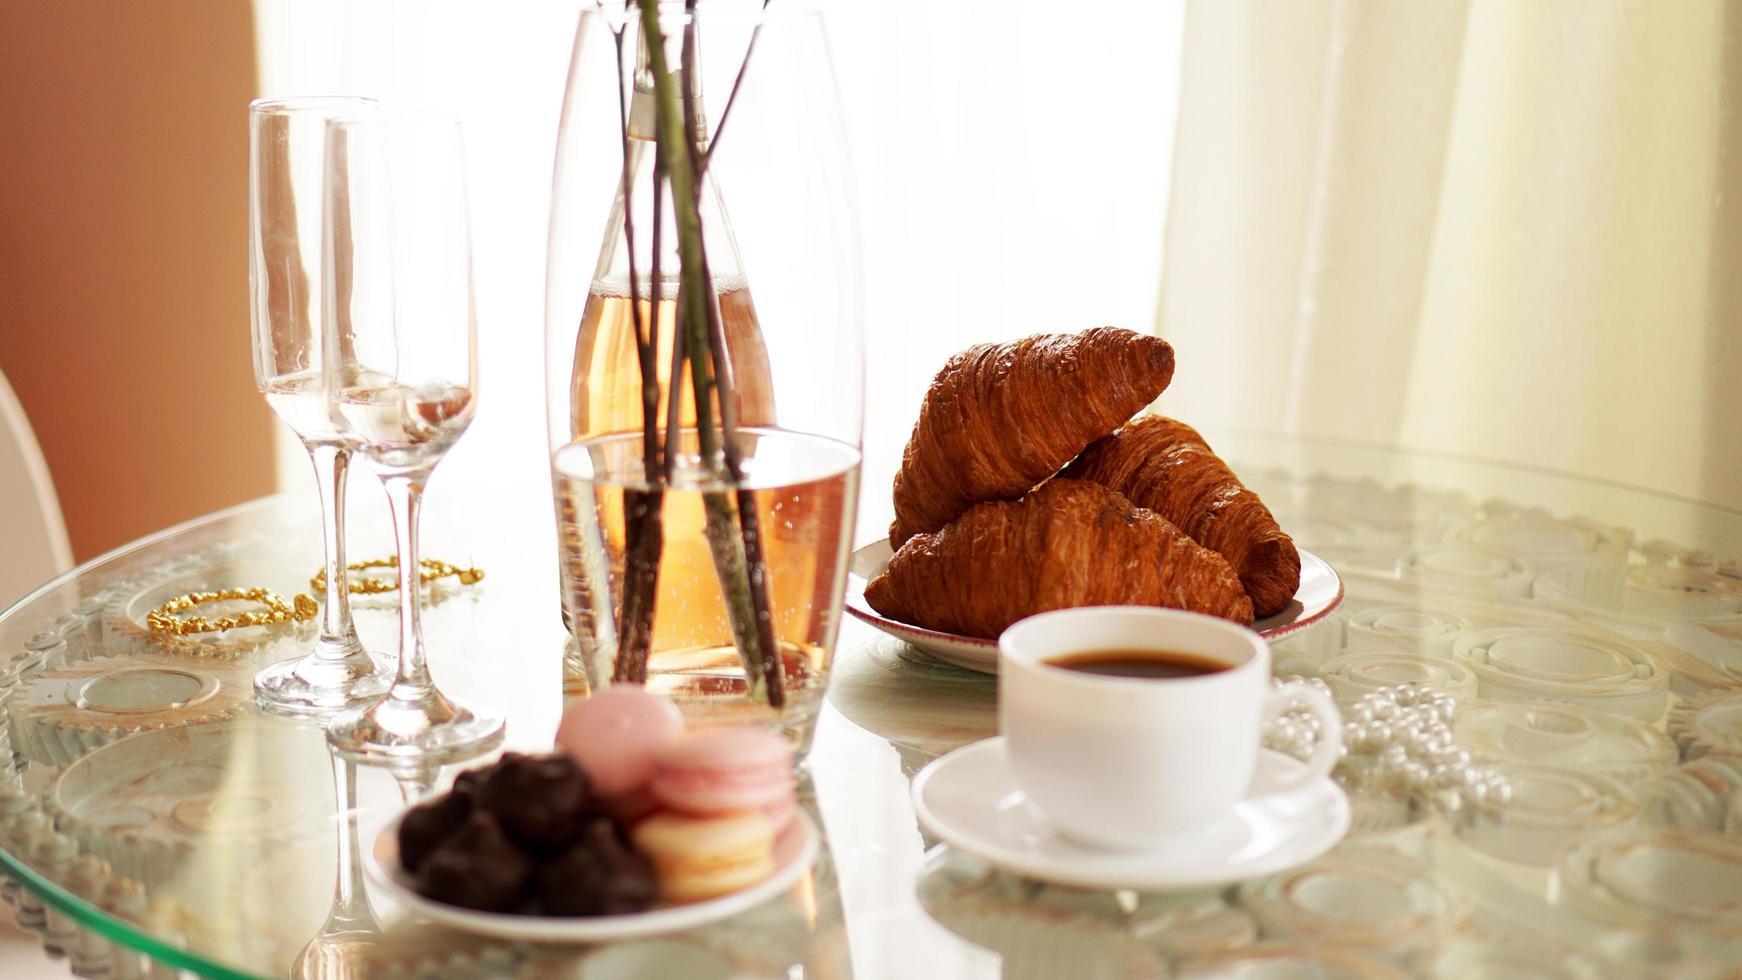 mesa de cristal con una taza de café, croissants dulces foto